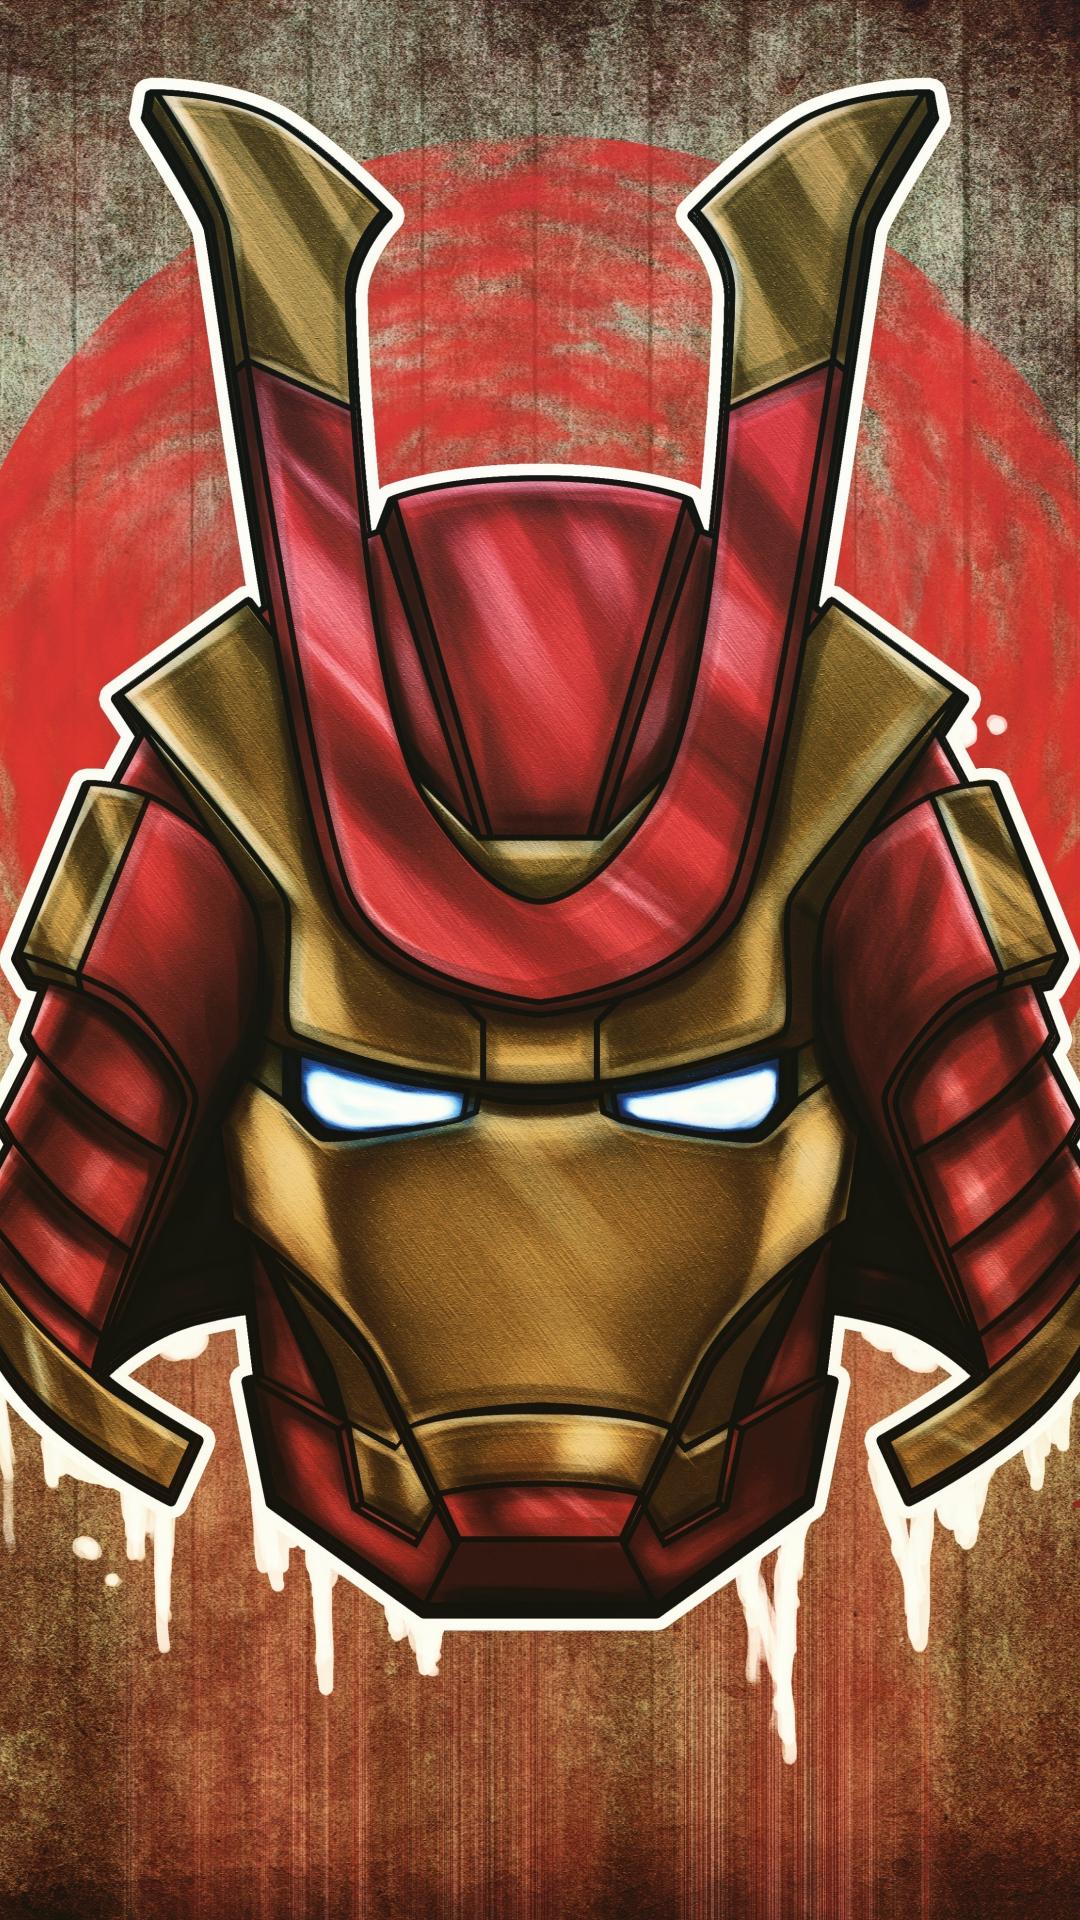 Download 1080x1920 Wallpaper Marvel Samurai Iron Man Art 4k